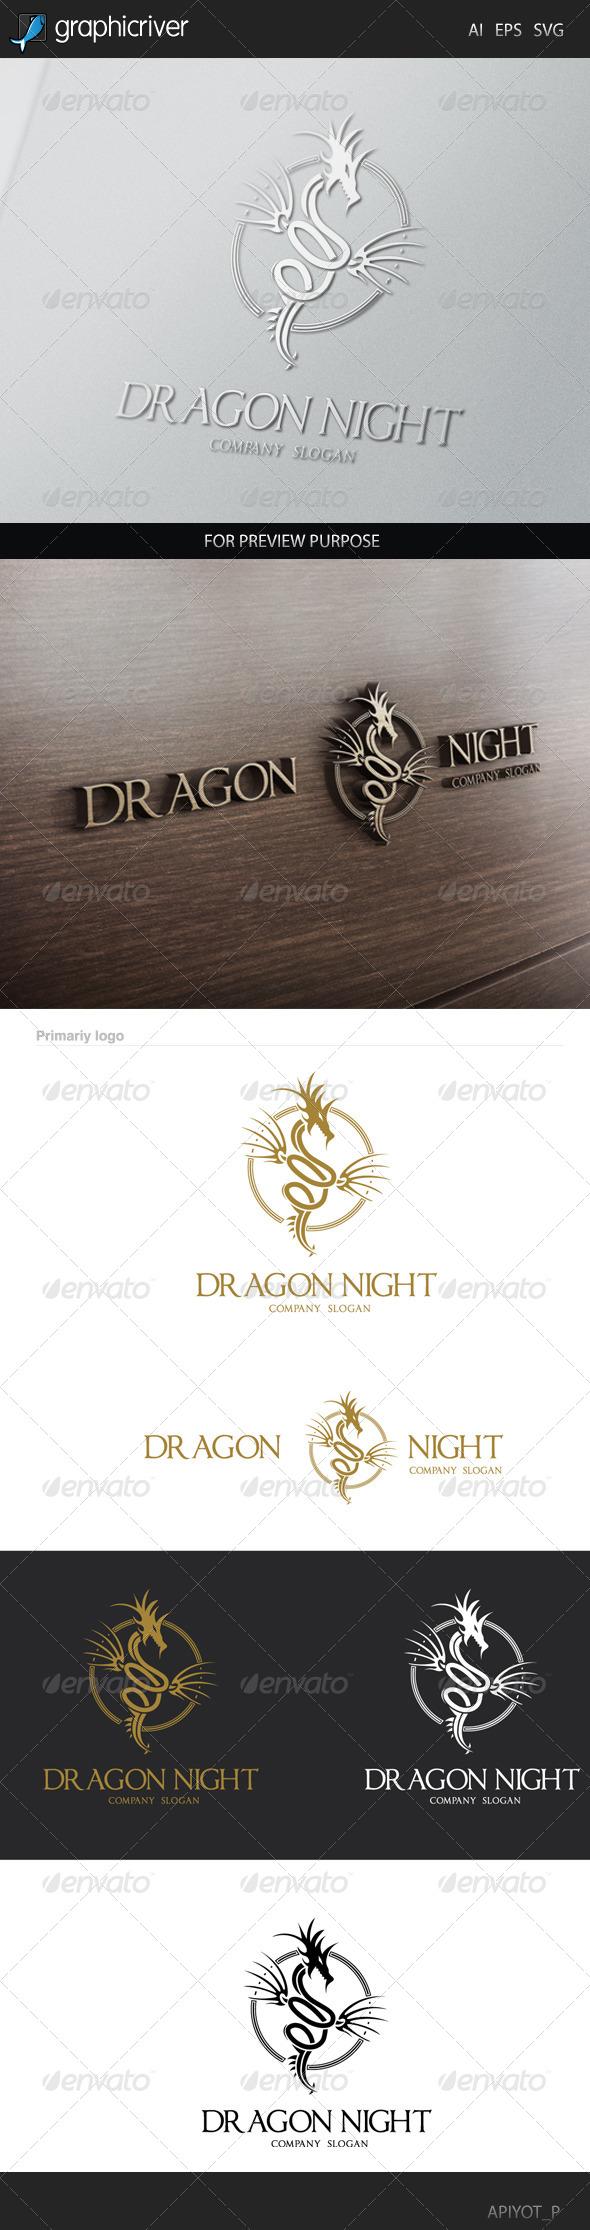 GraphicRiver Dragon Night Logo 8531347